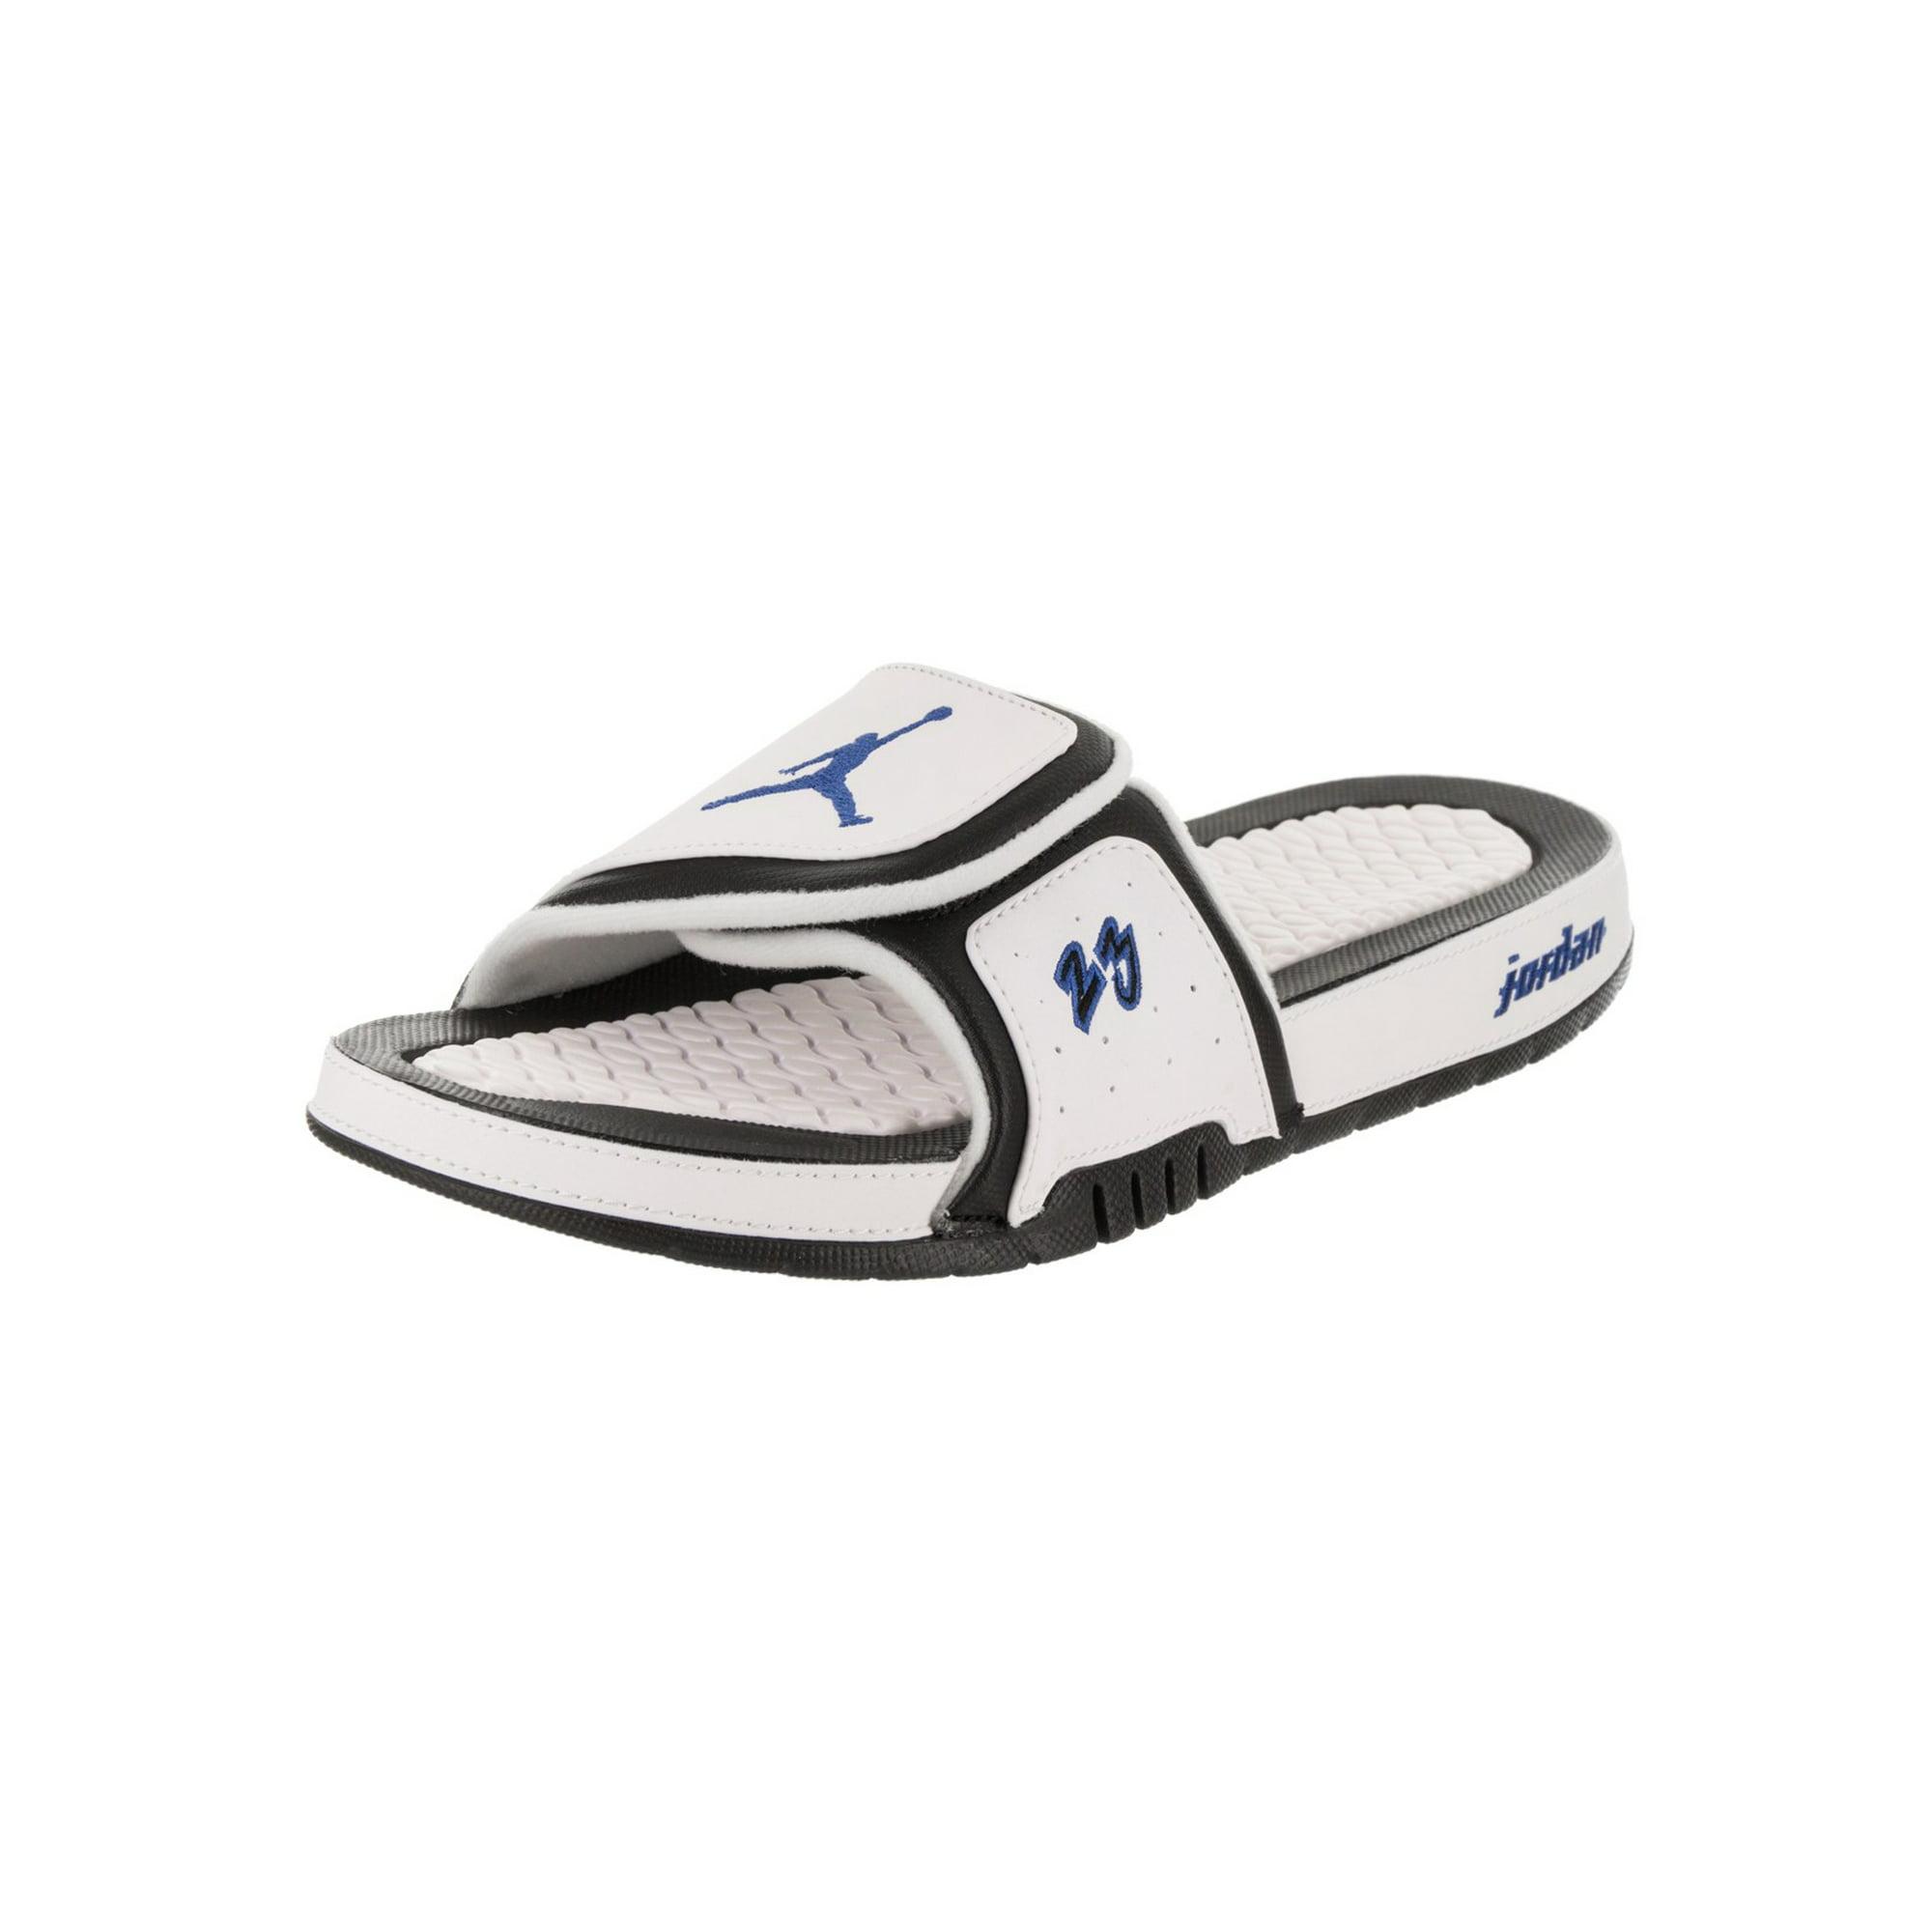 5b2c111c7170af Nike Jordan Men s Hydro X Retro Sandal